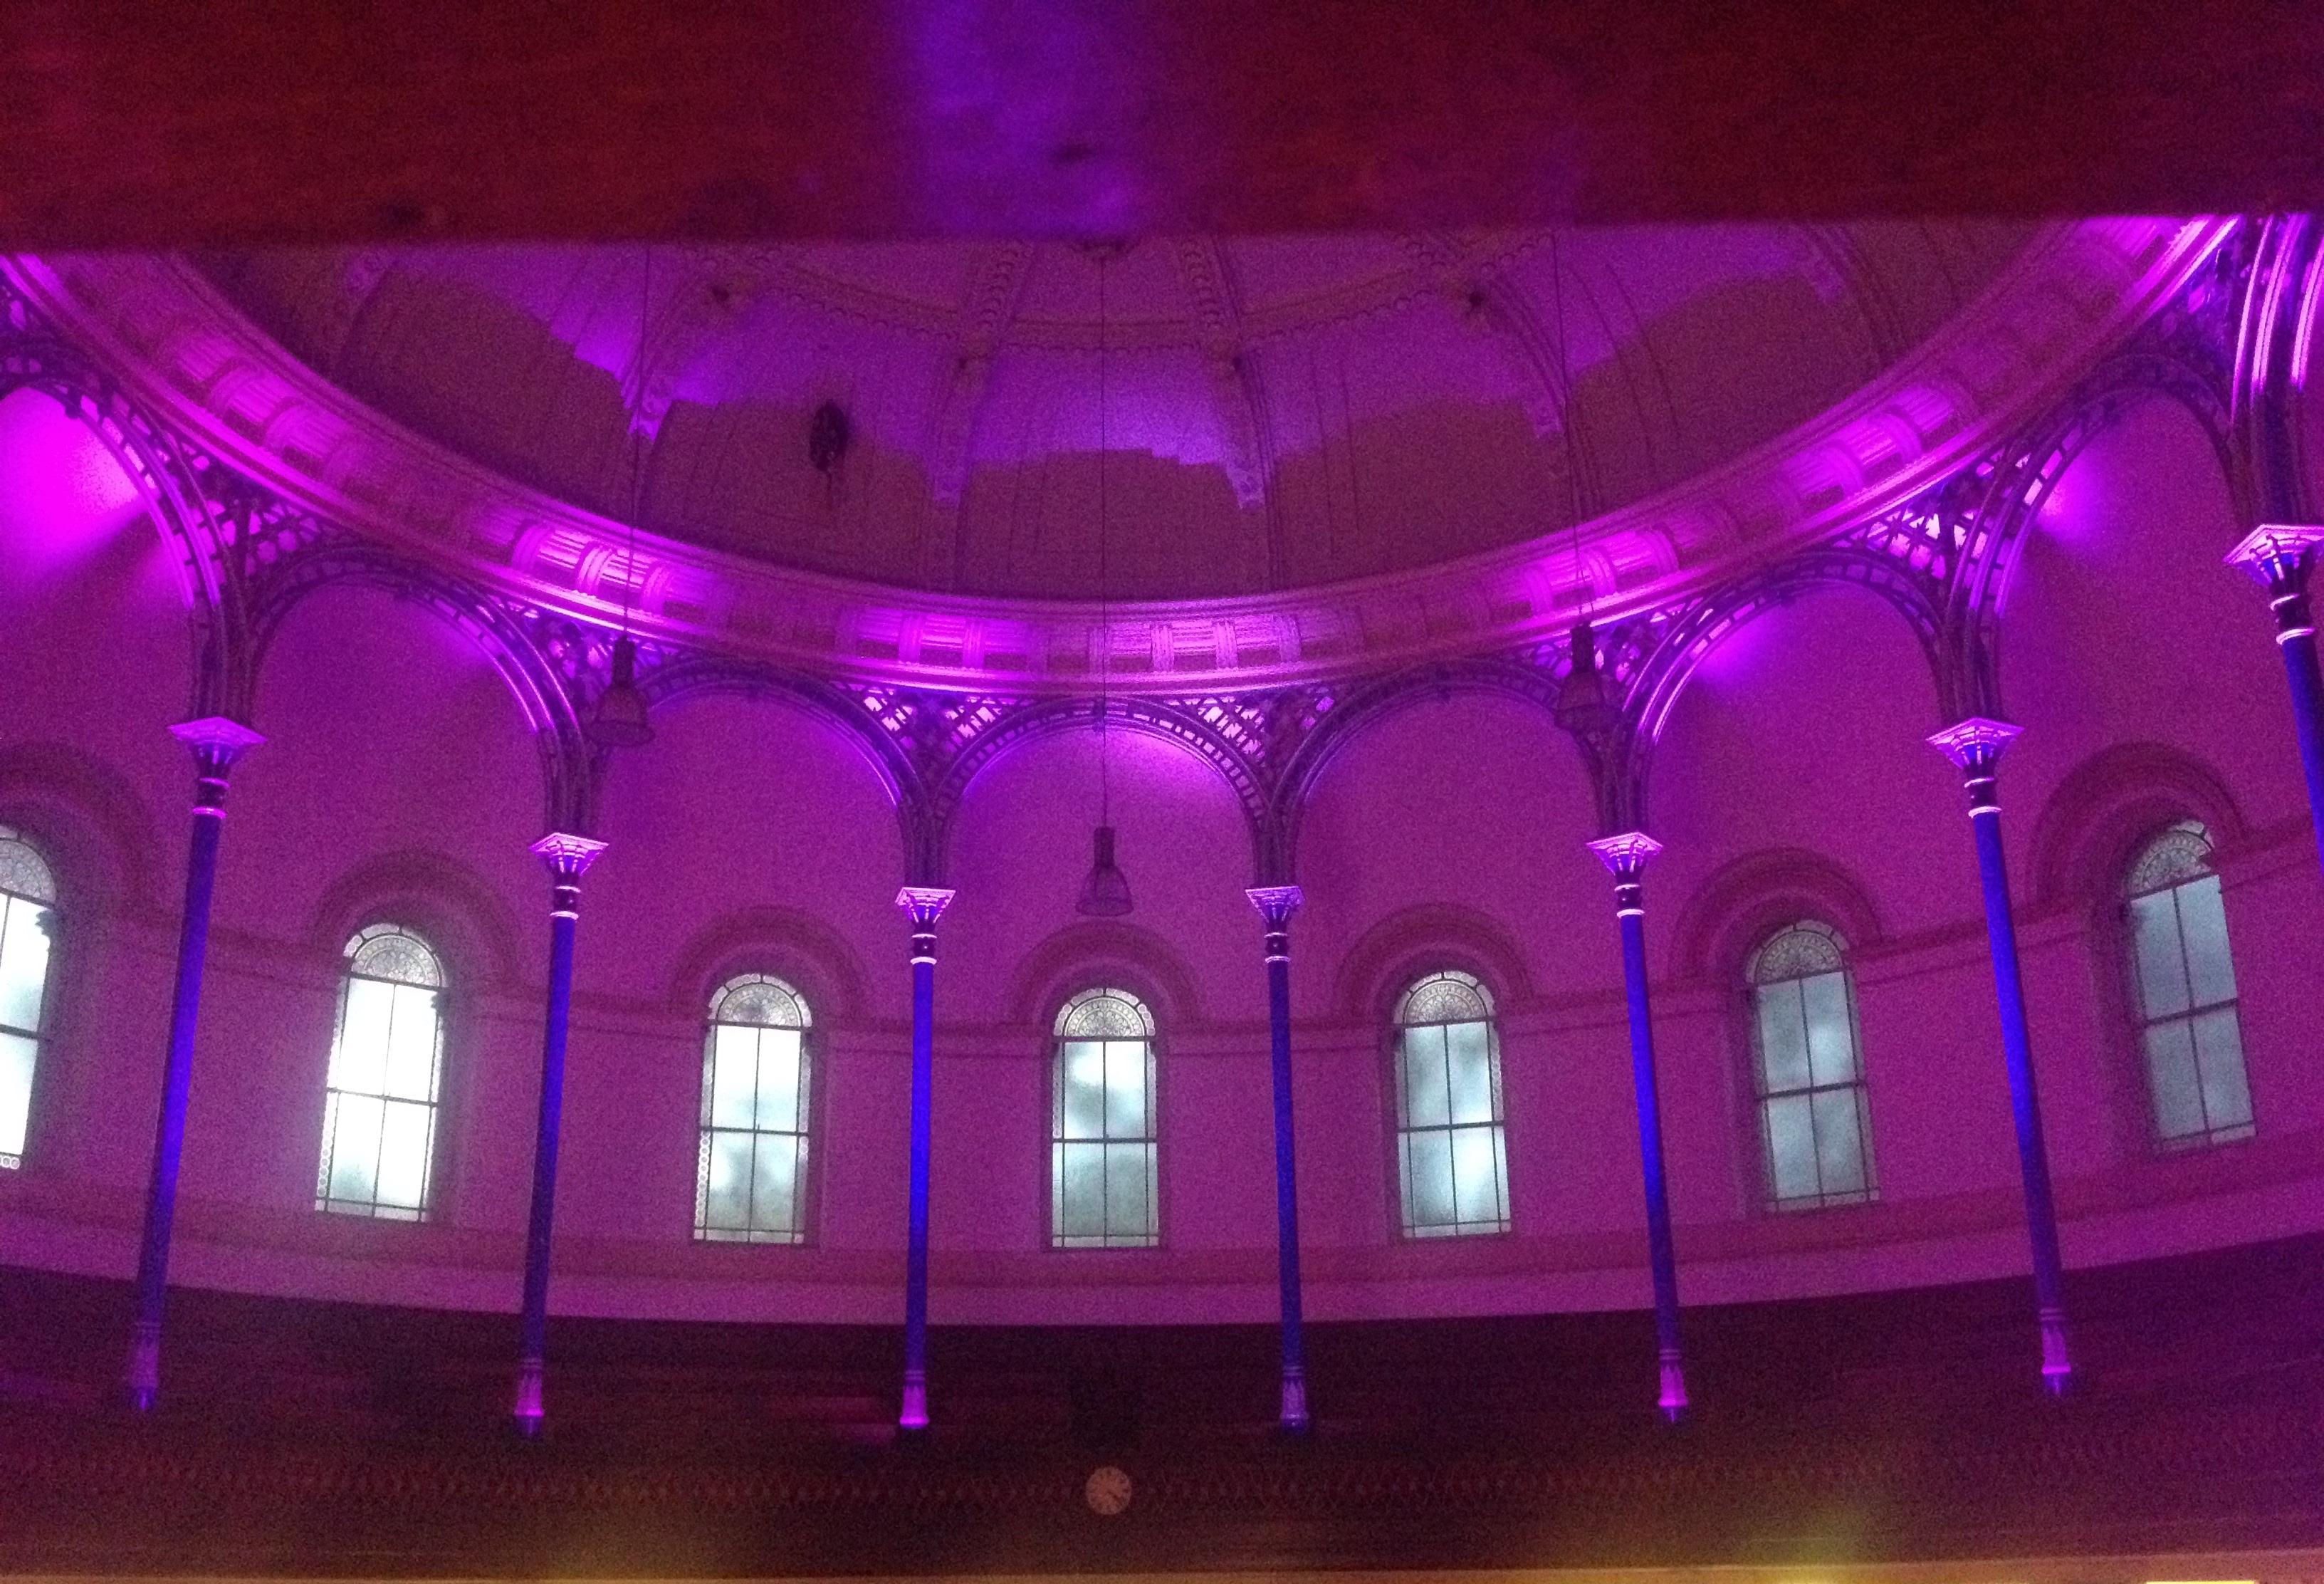 Uplighting pillars at a wedding.